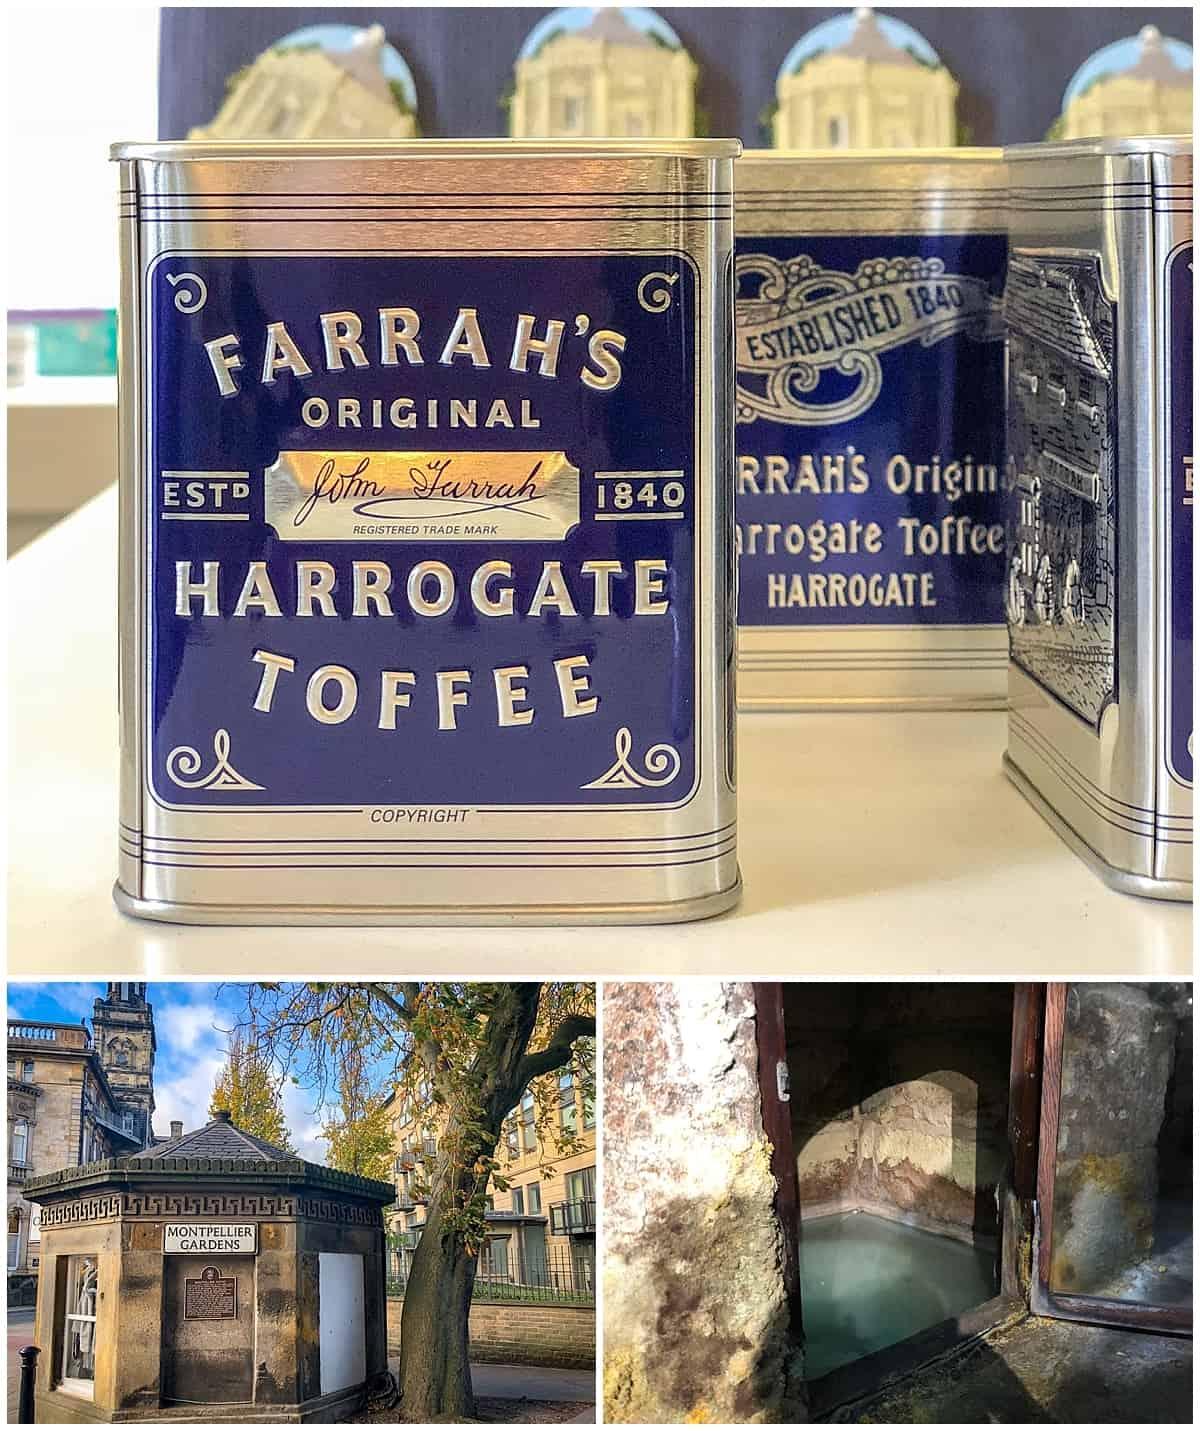 Things to do in Harrogate